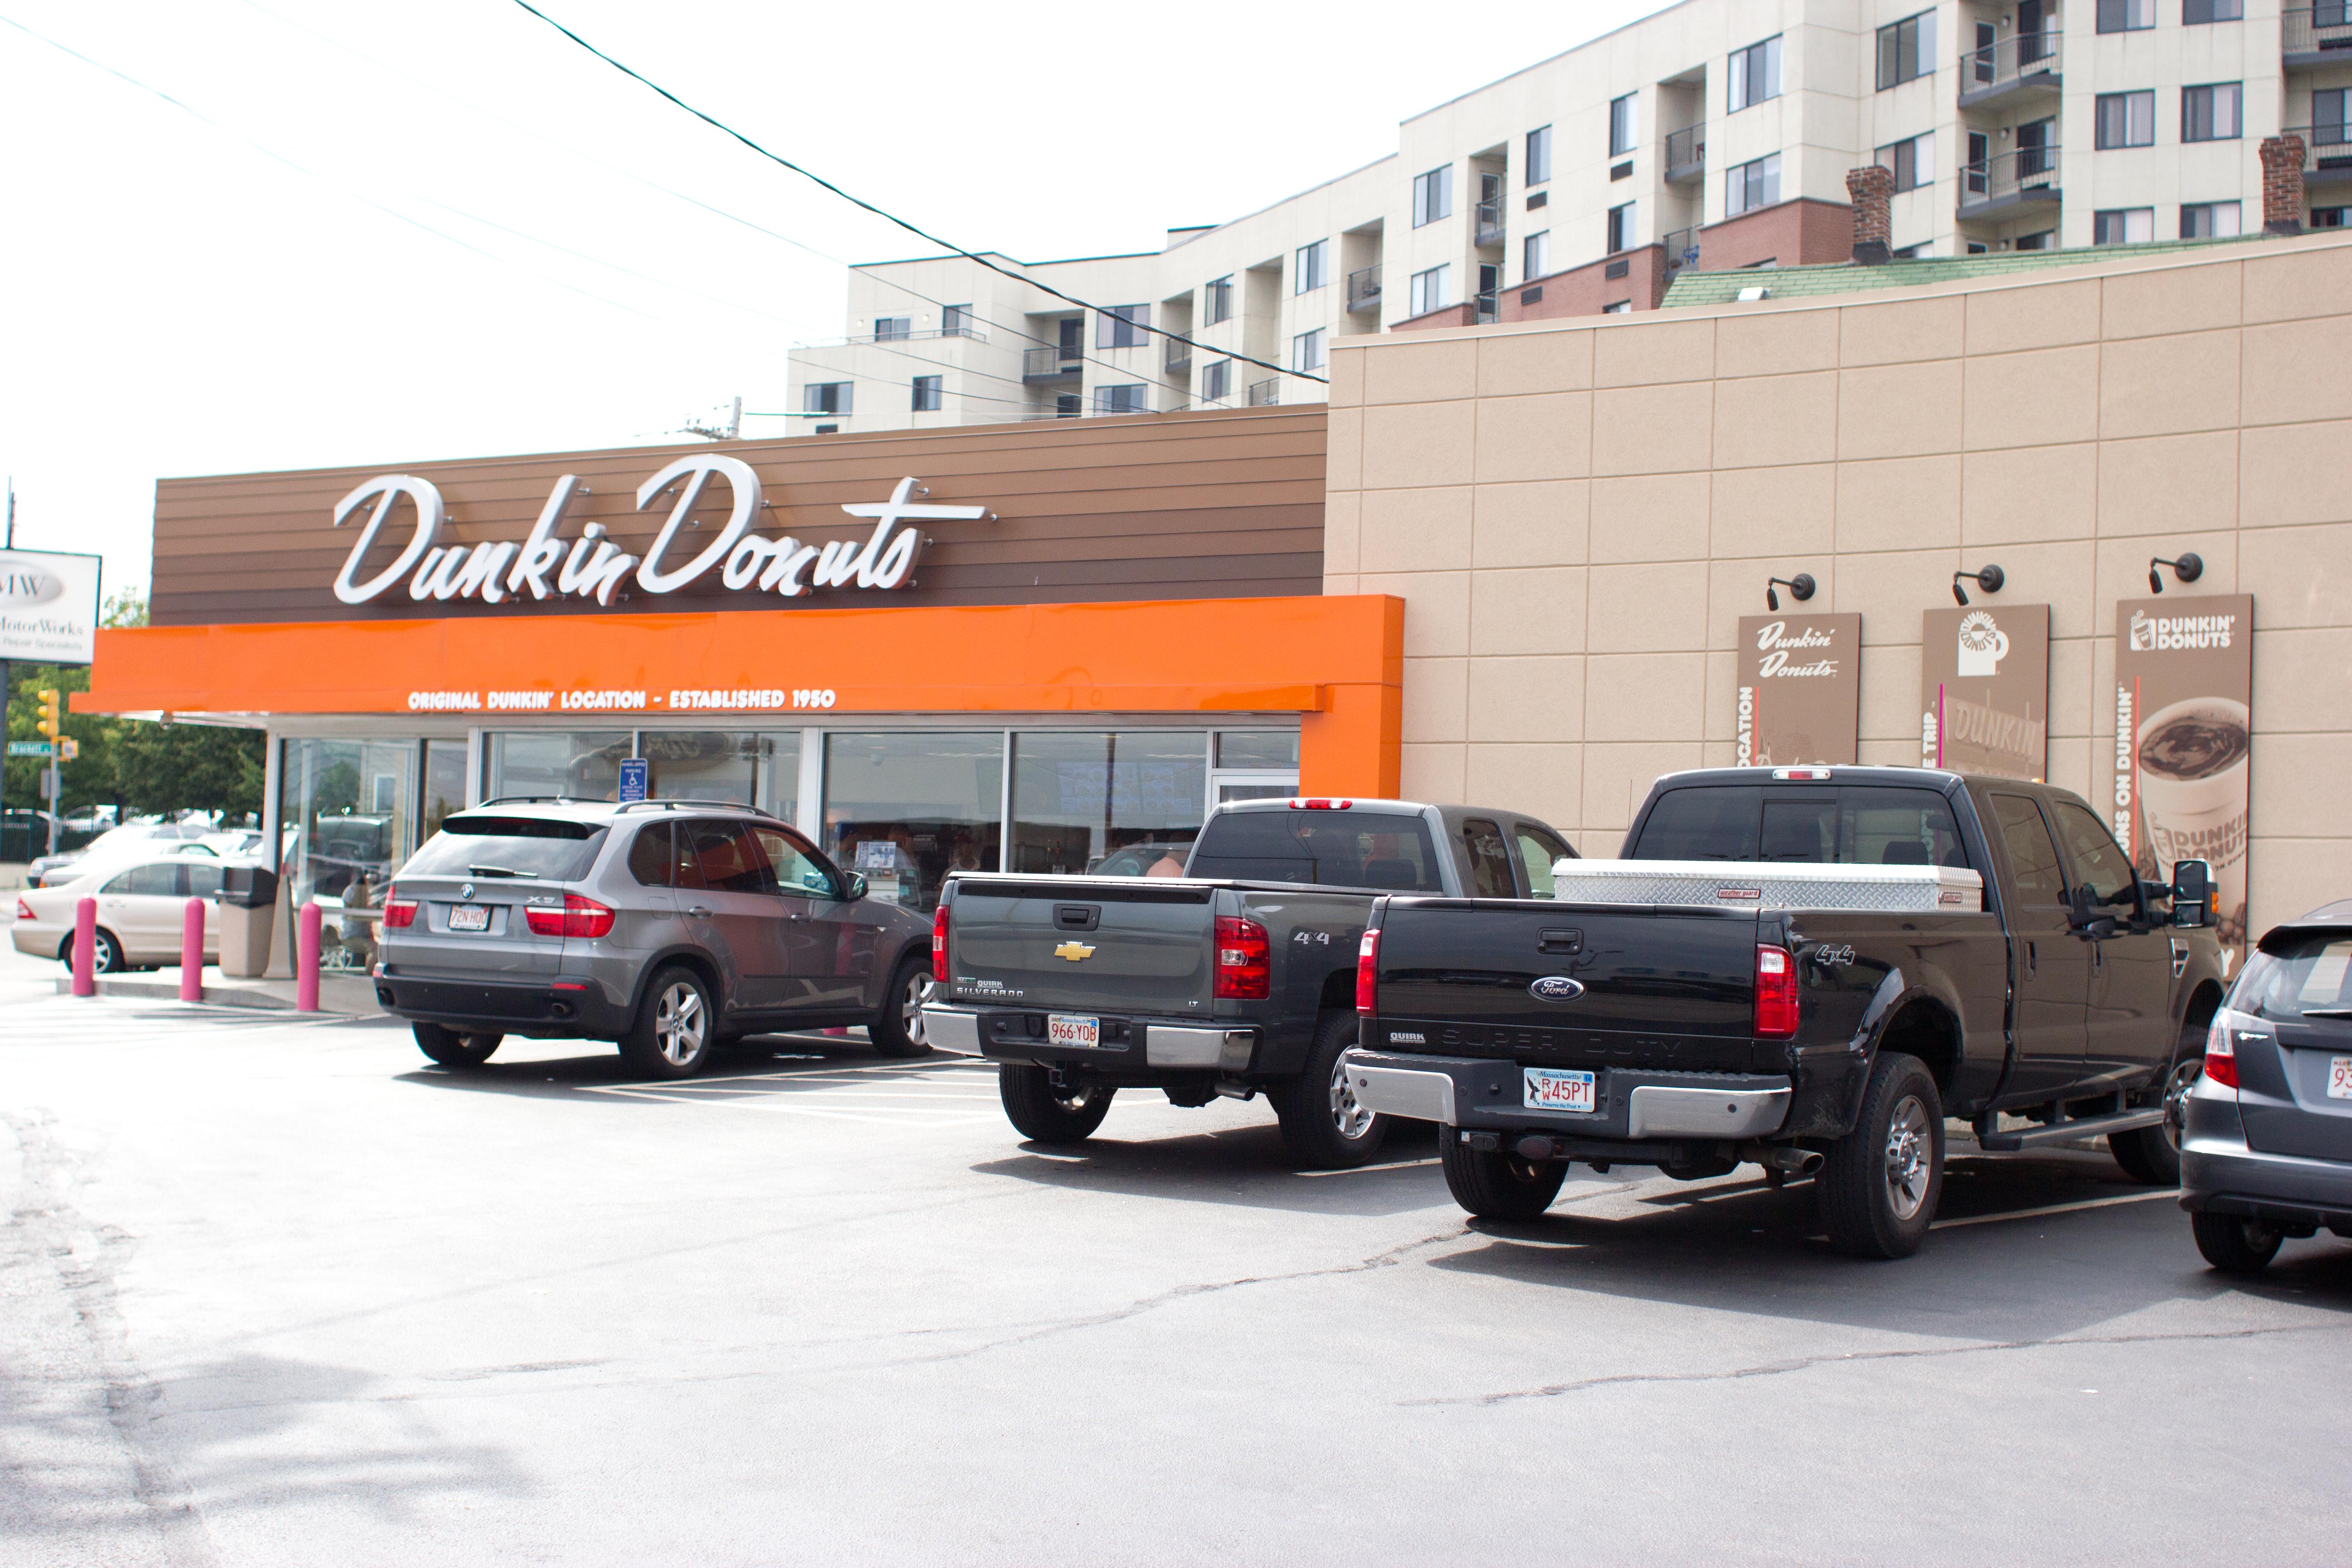 original Dunkin' Donuts in Quincy, Massachusetts